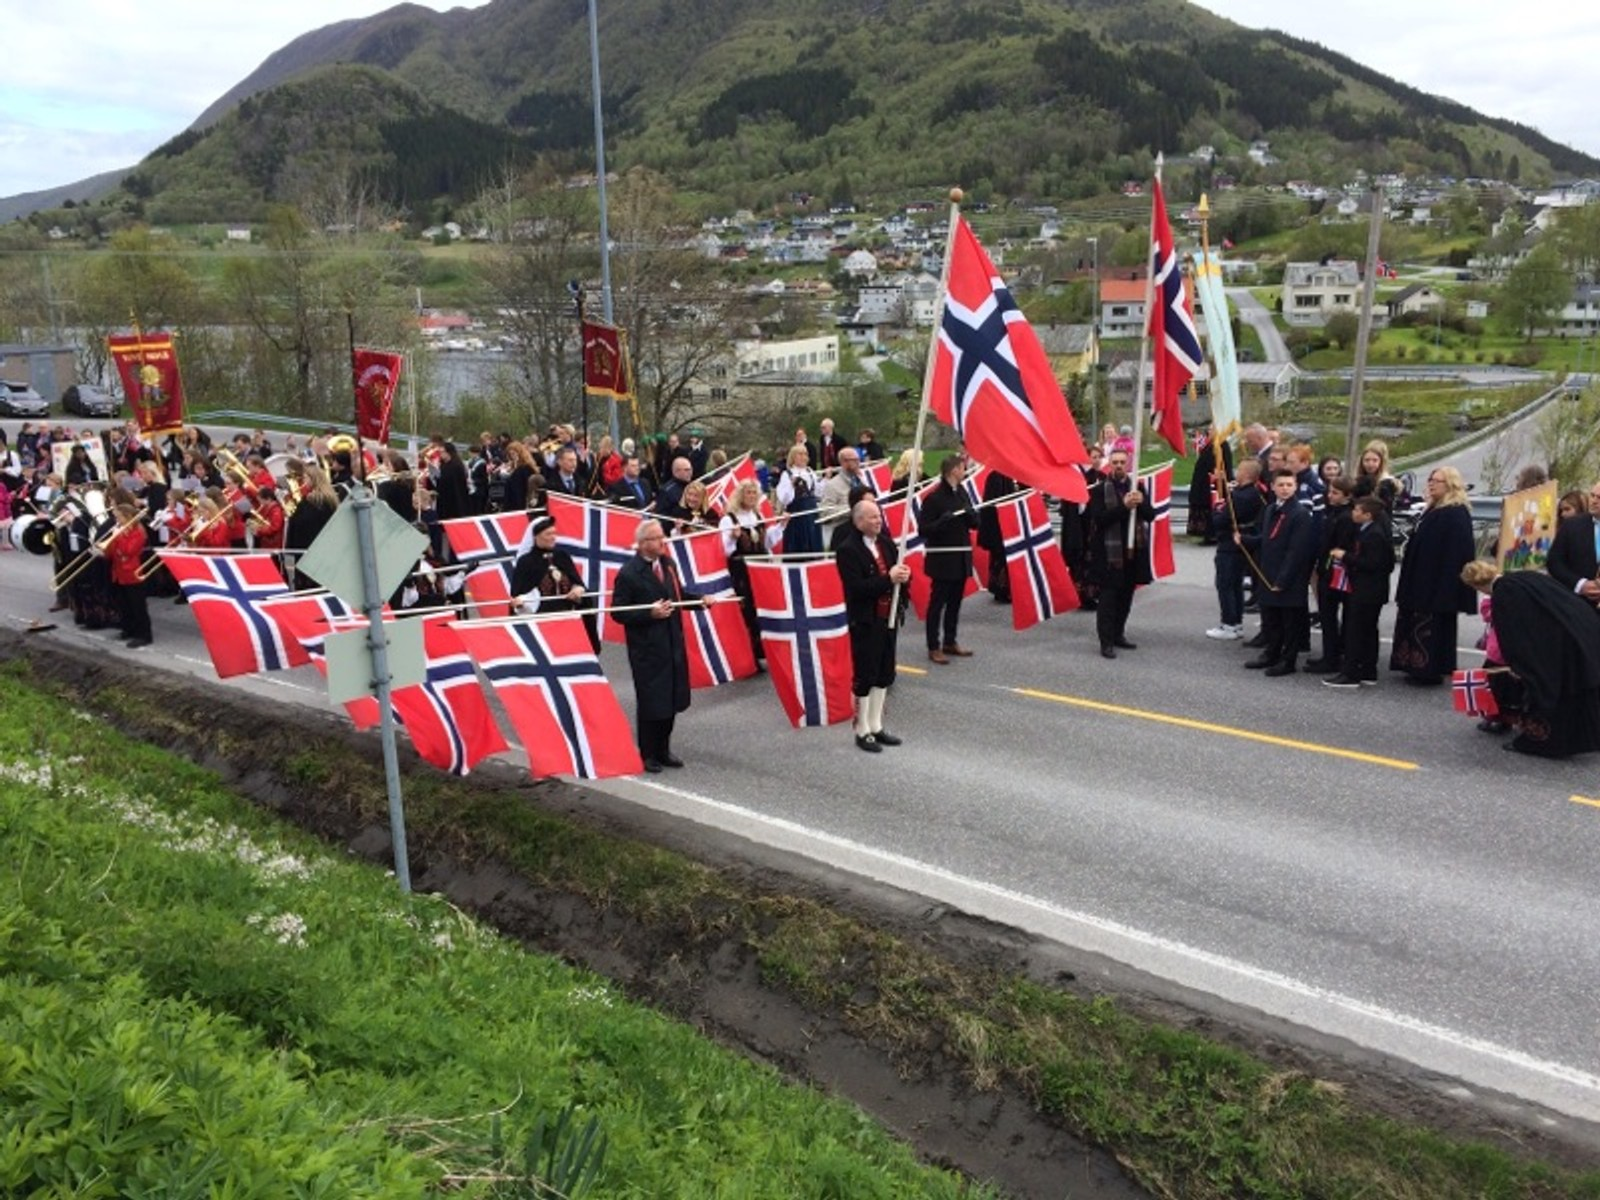 17.mai i Tennfjord og Vatne.